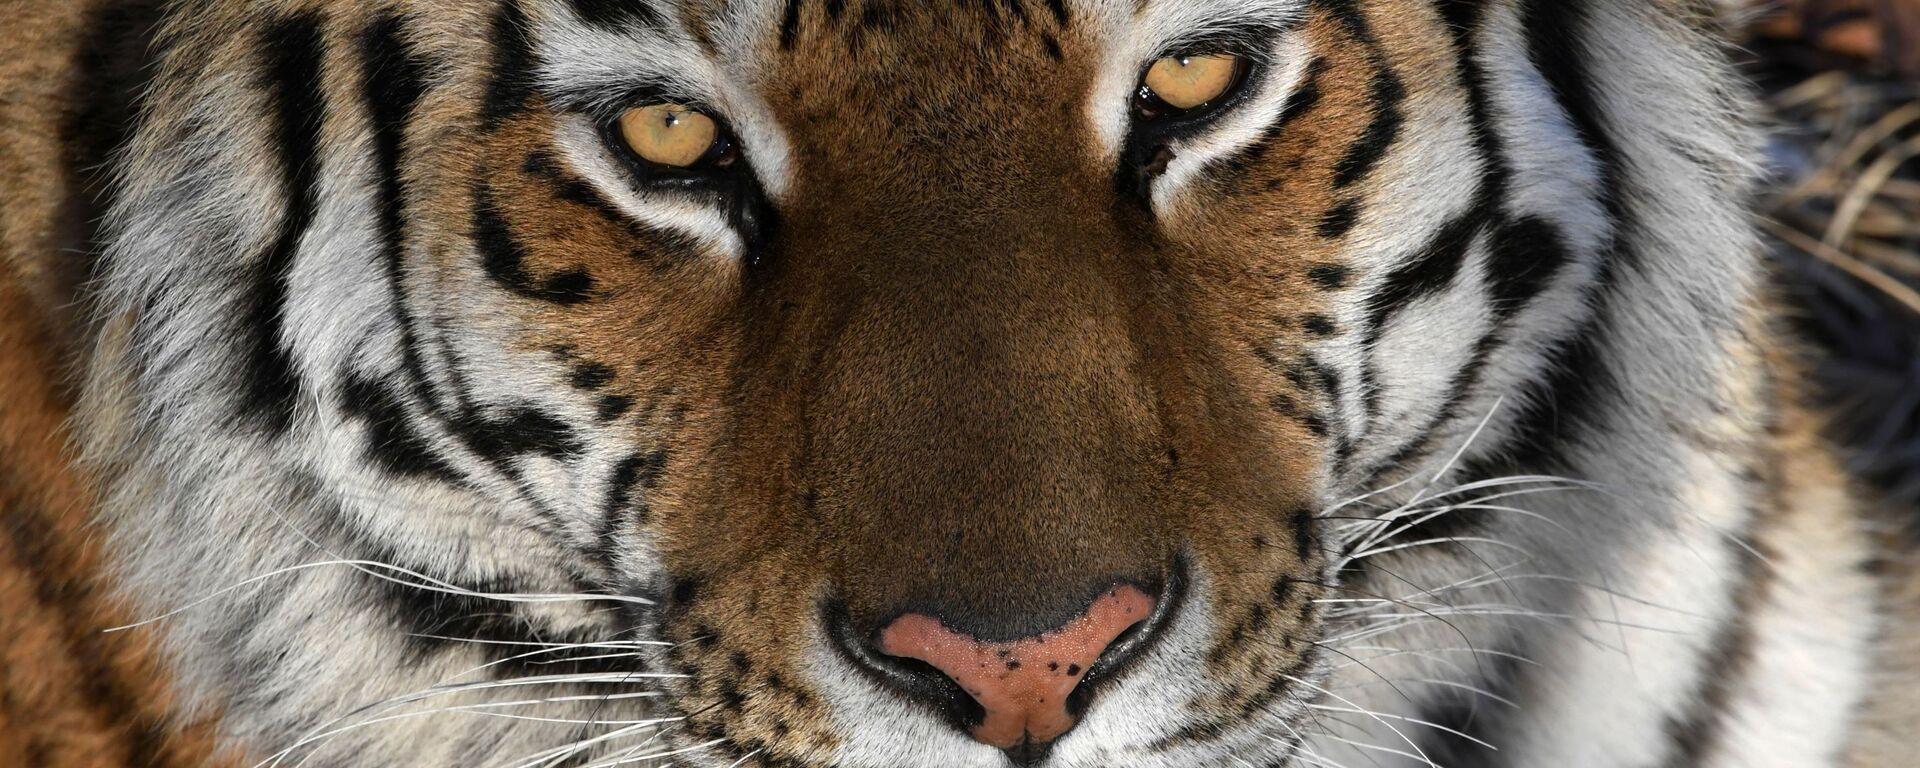 La tigre dell'Amur - Sputnik Italia, 1920, 06.04.2020